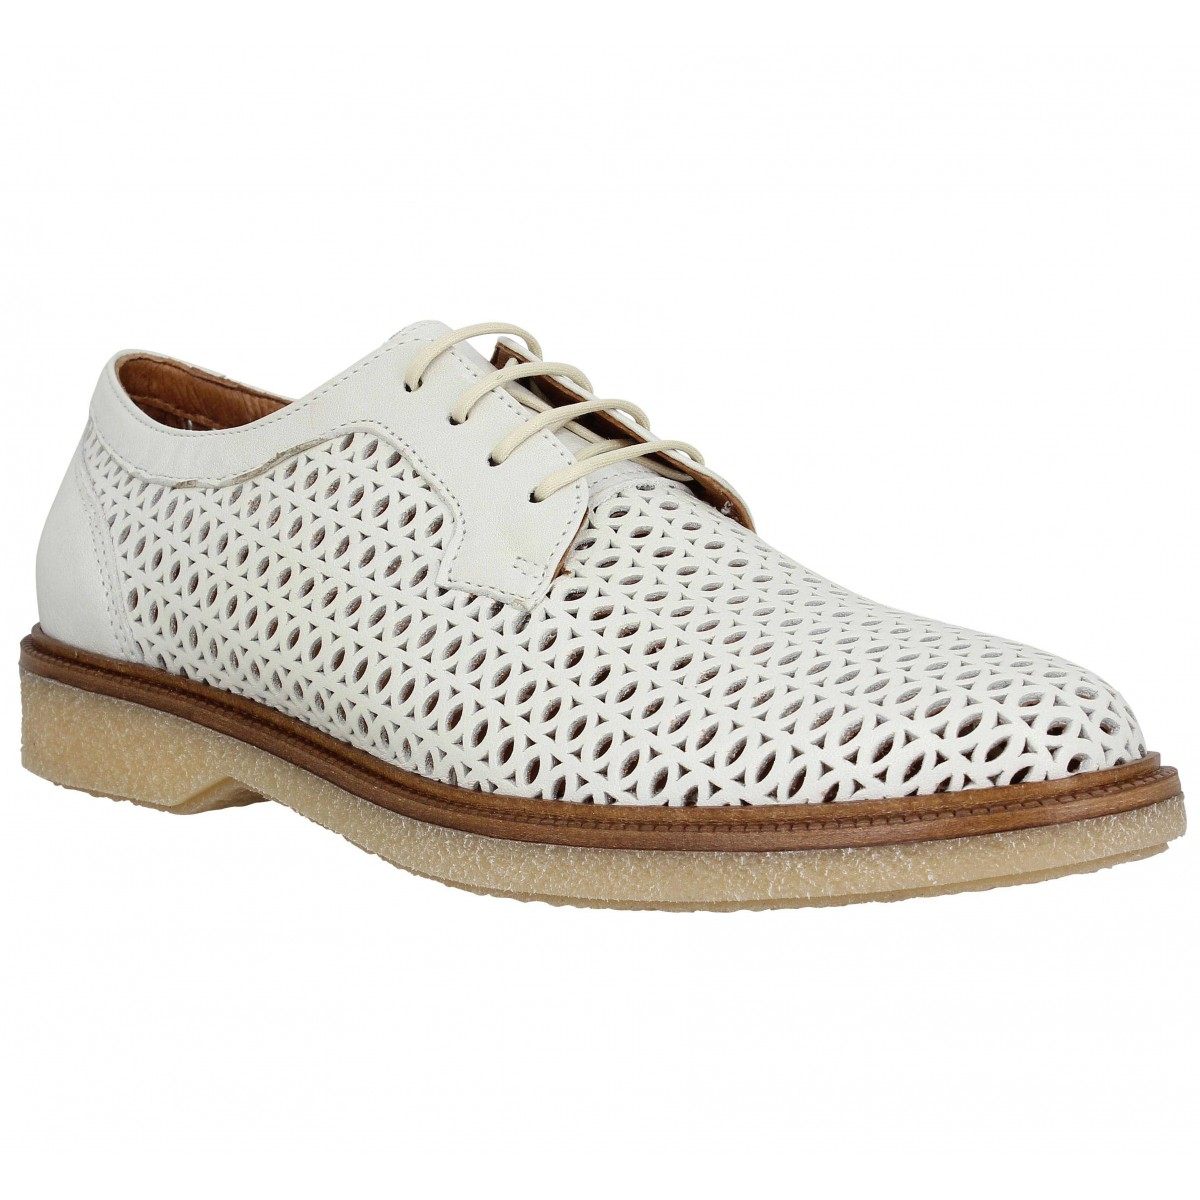 Chaussures à lacets SCHMOOVE Darwin Classic cuir Femme Dove